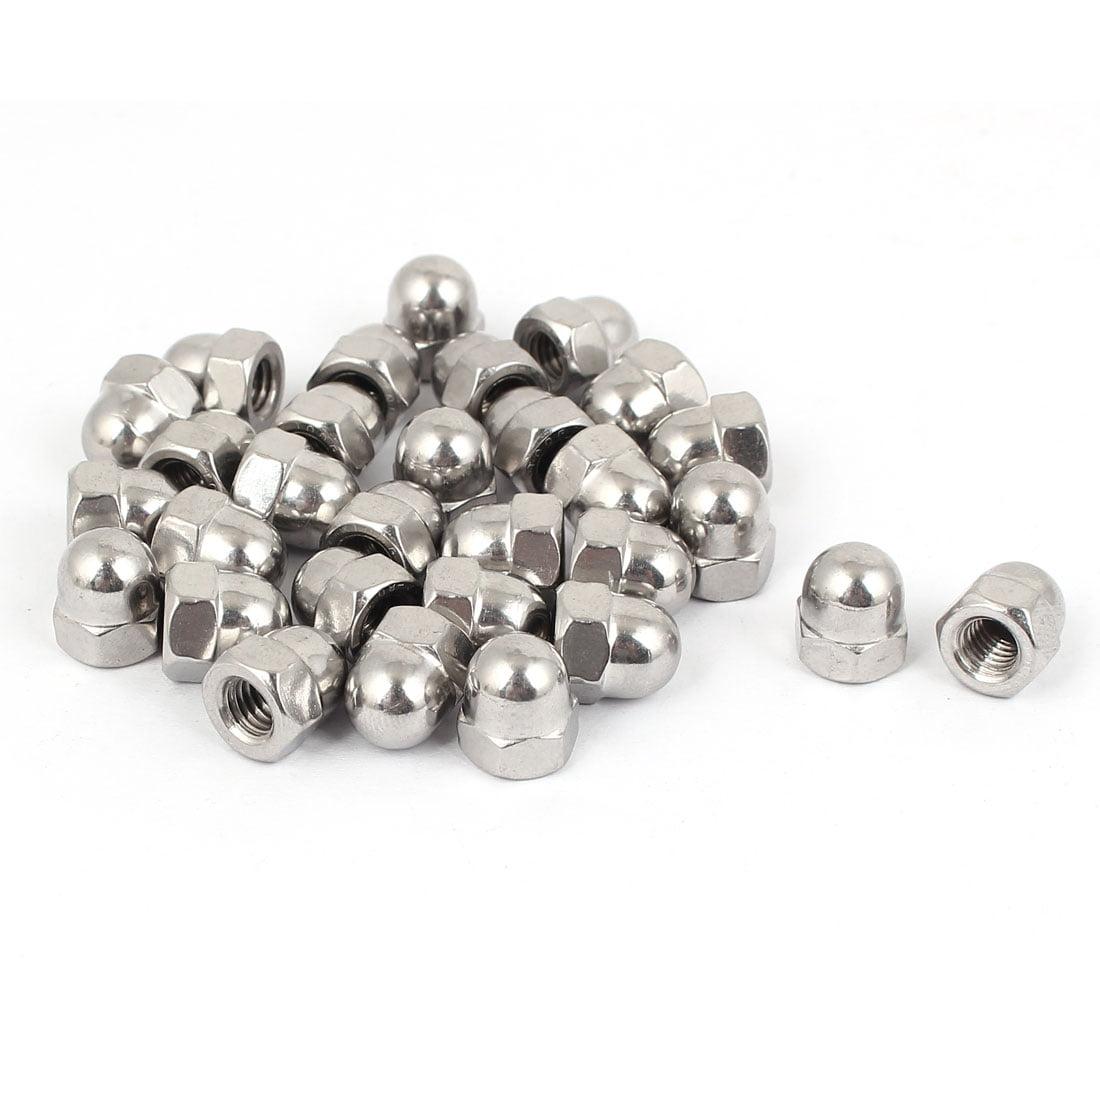 M12 Thread Dia 316 Stainless Steel Dome Head Cap Acorn Hex Nut Silver Tone 4pcs